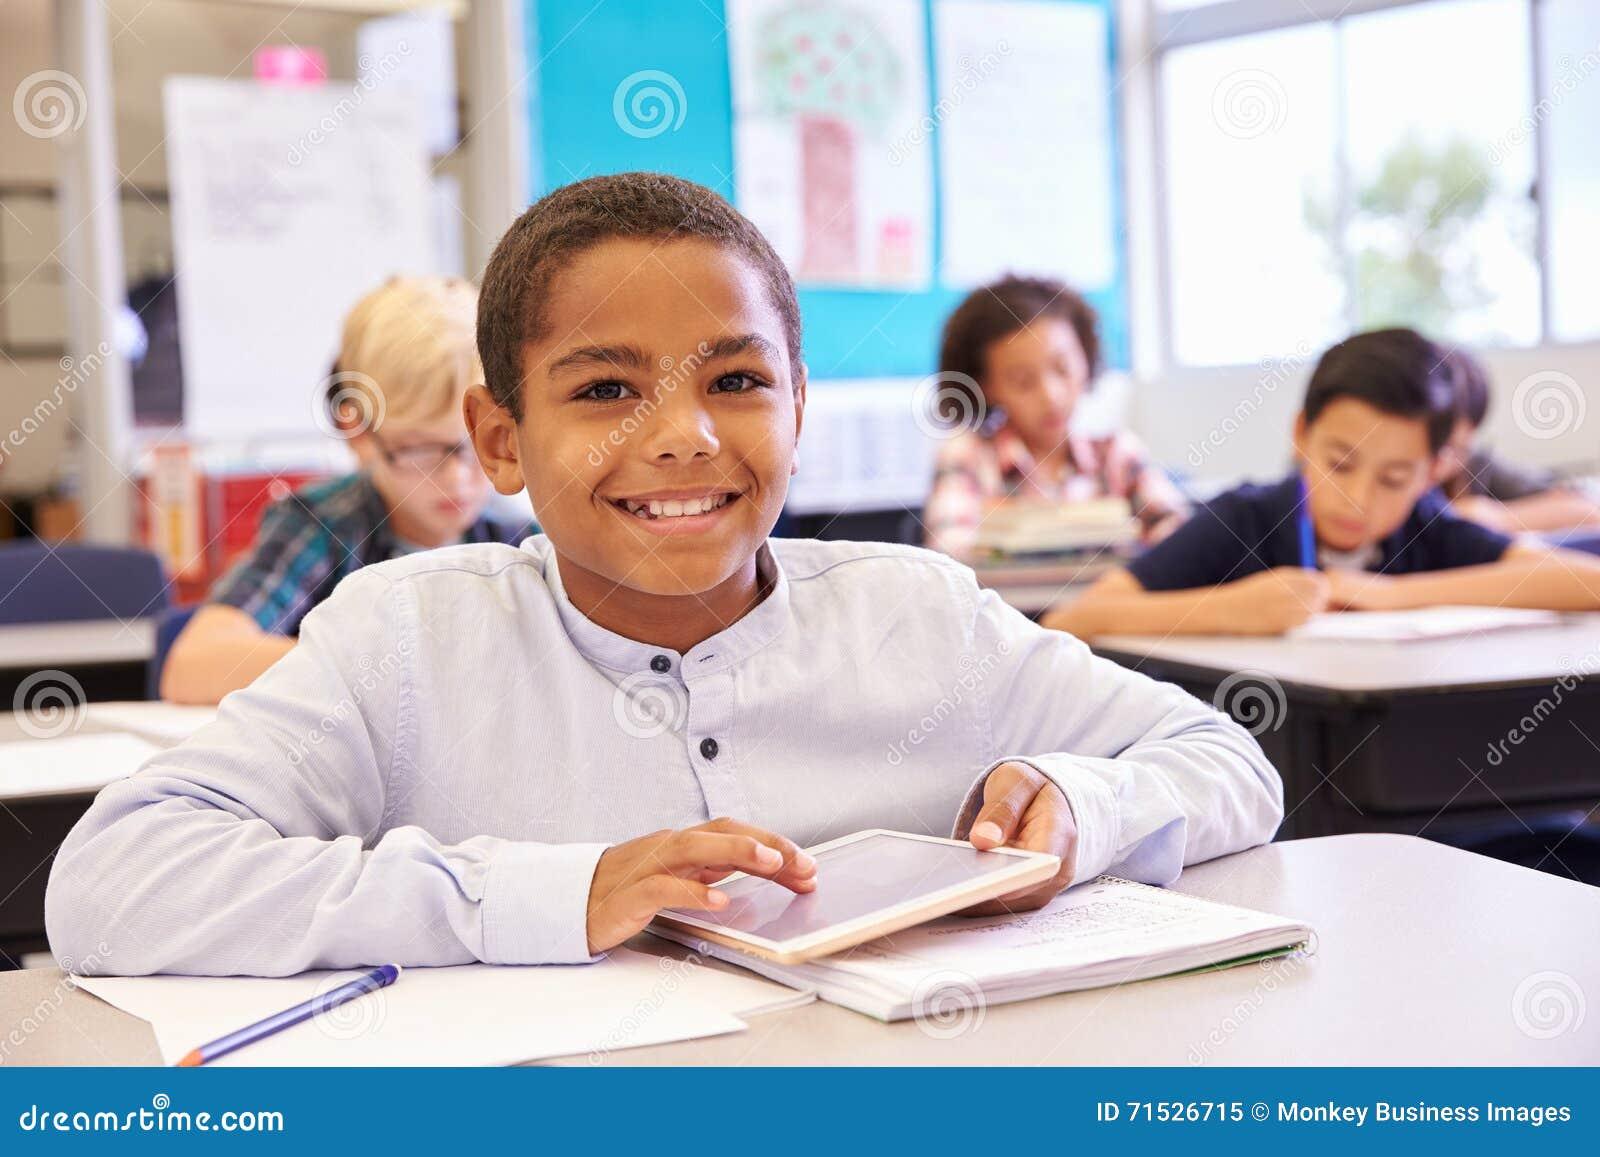 Pojke med minnestavlan i grundskolagrupp, stående